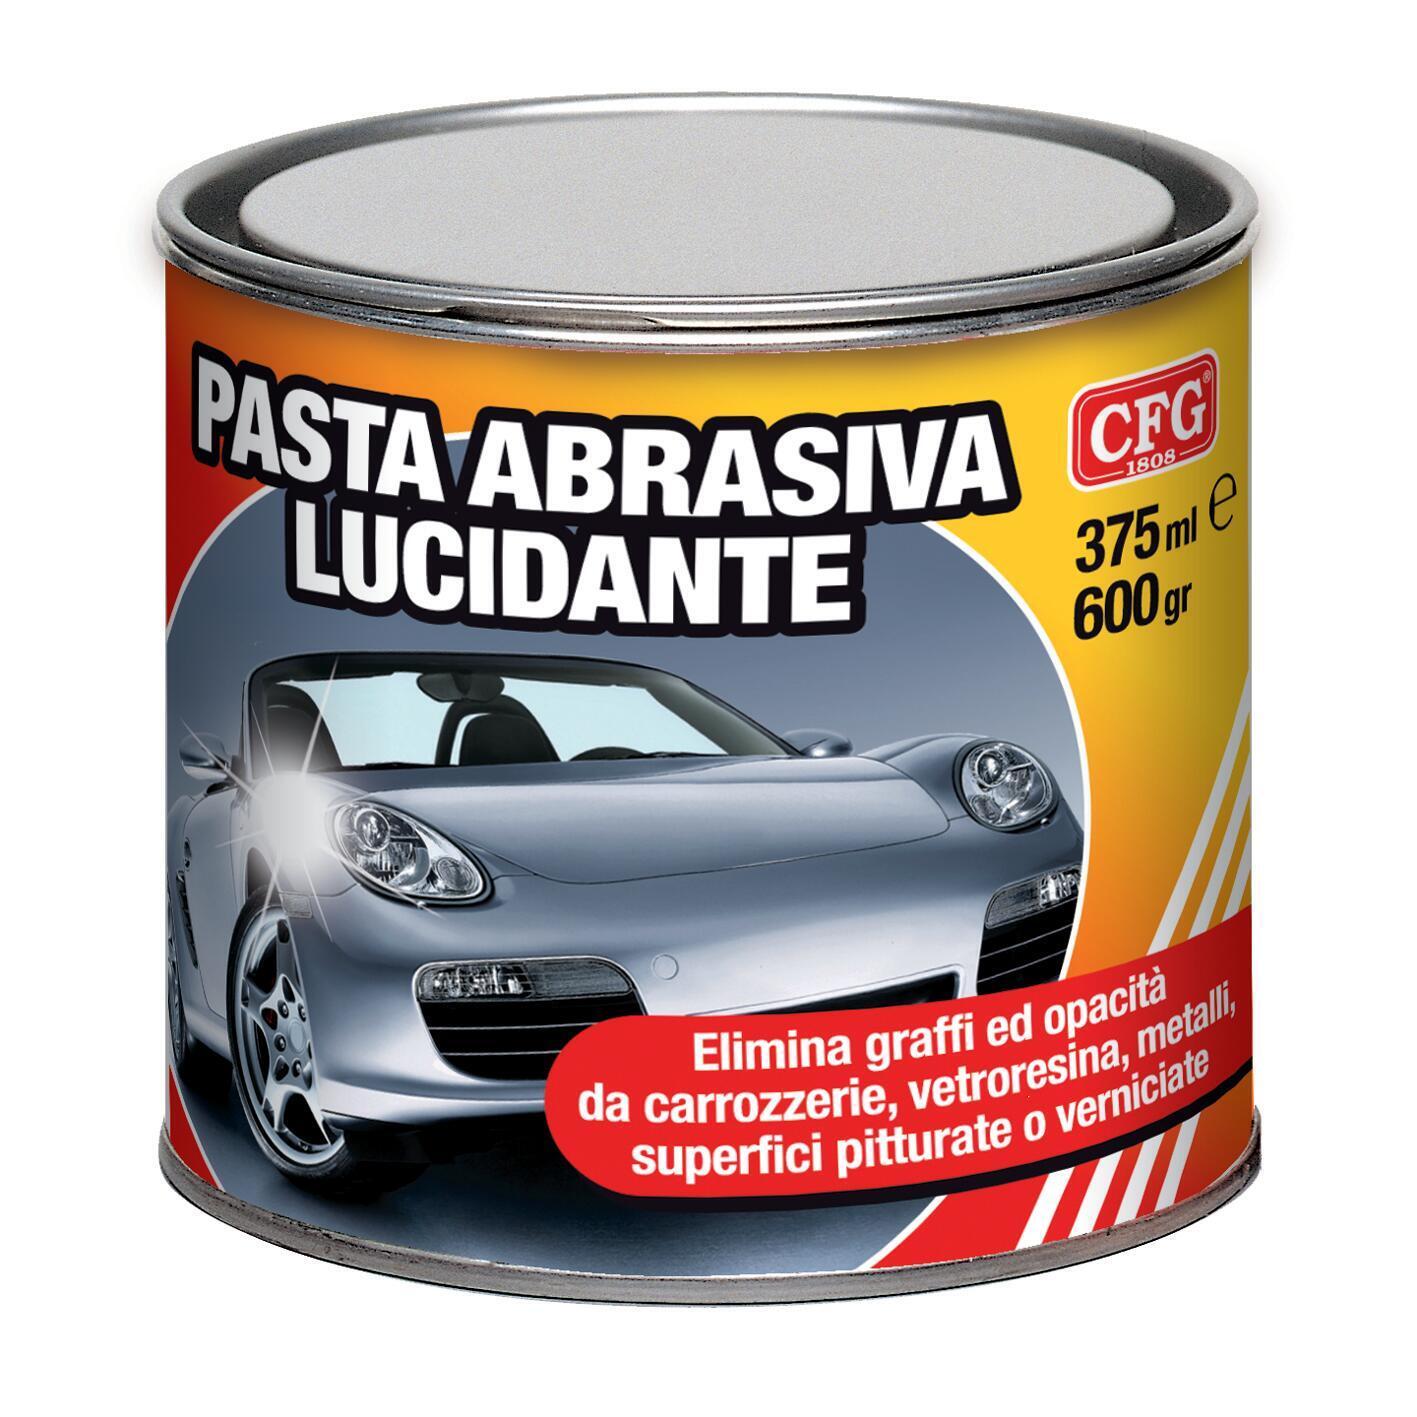 Remover CFG Pasta abrasiva lucidante 375 ml - 3